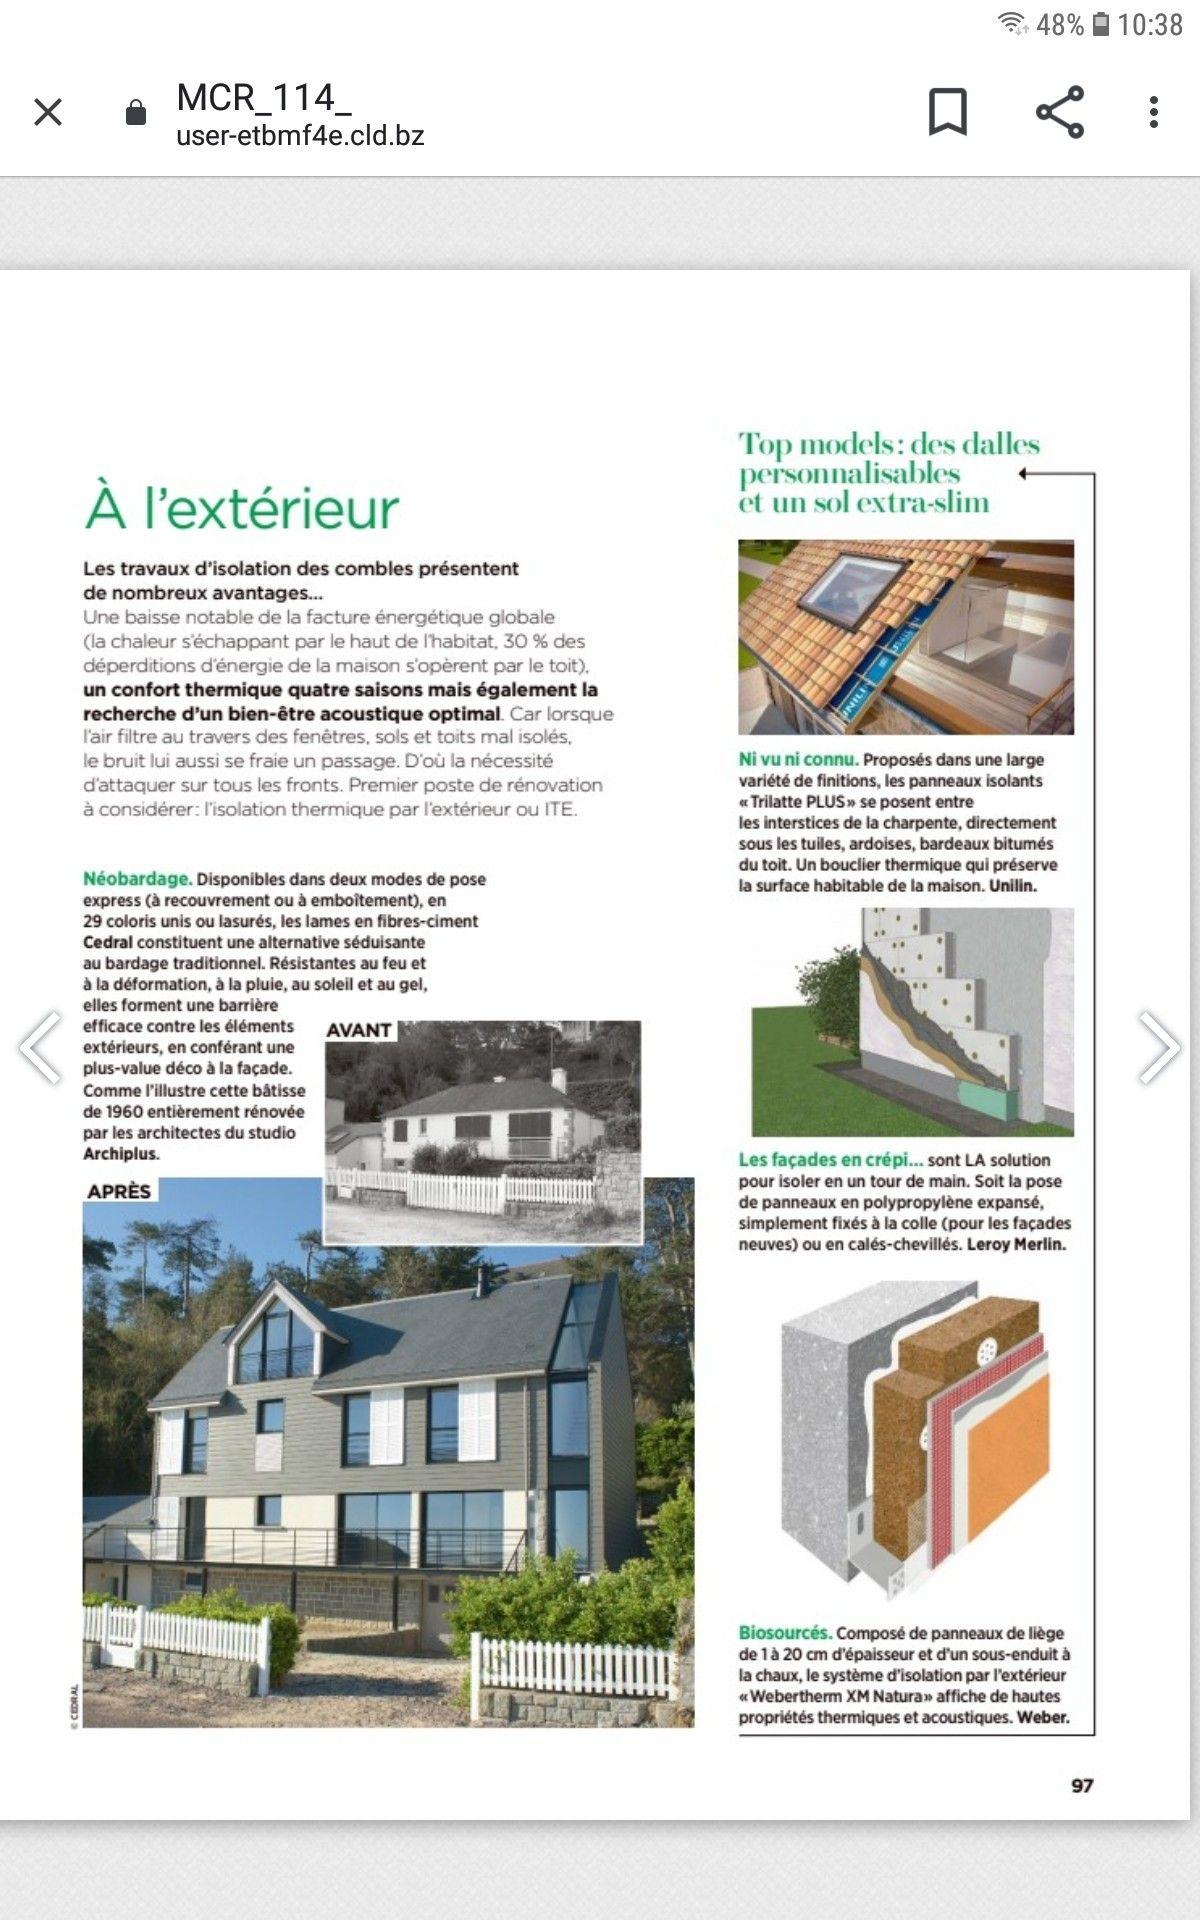 Avant Apres Tire Du Magazine Maison Creative Magazine Maison Isolation Combles Habitat